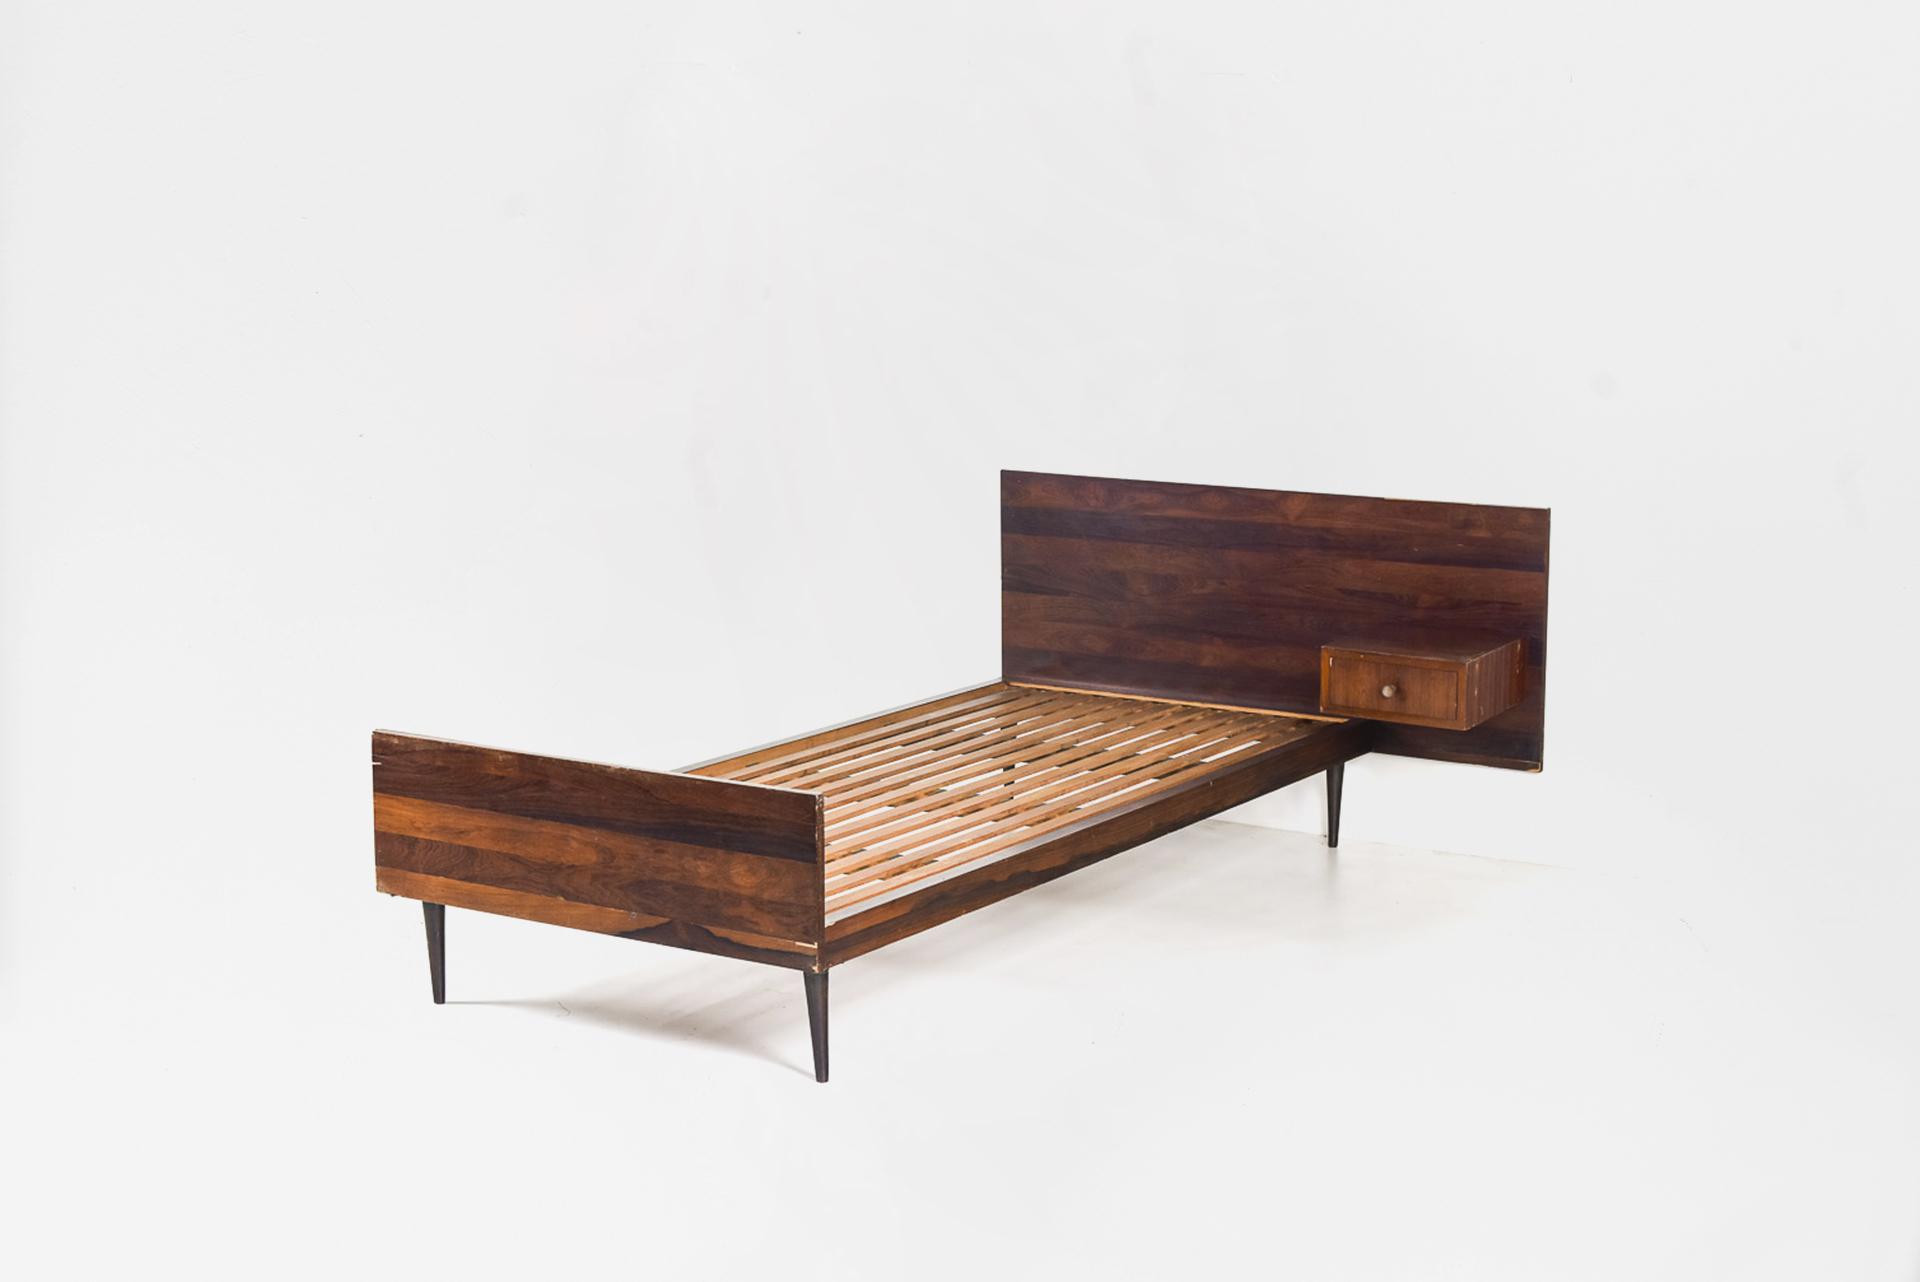 Bed Manufactured by Unilabor Brasil, 1960 Jacaranda wood